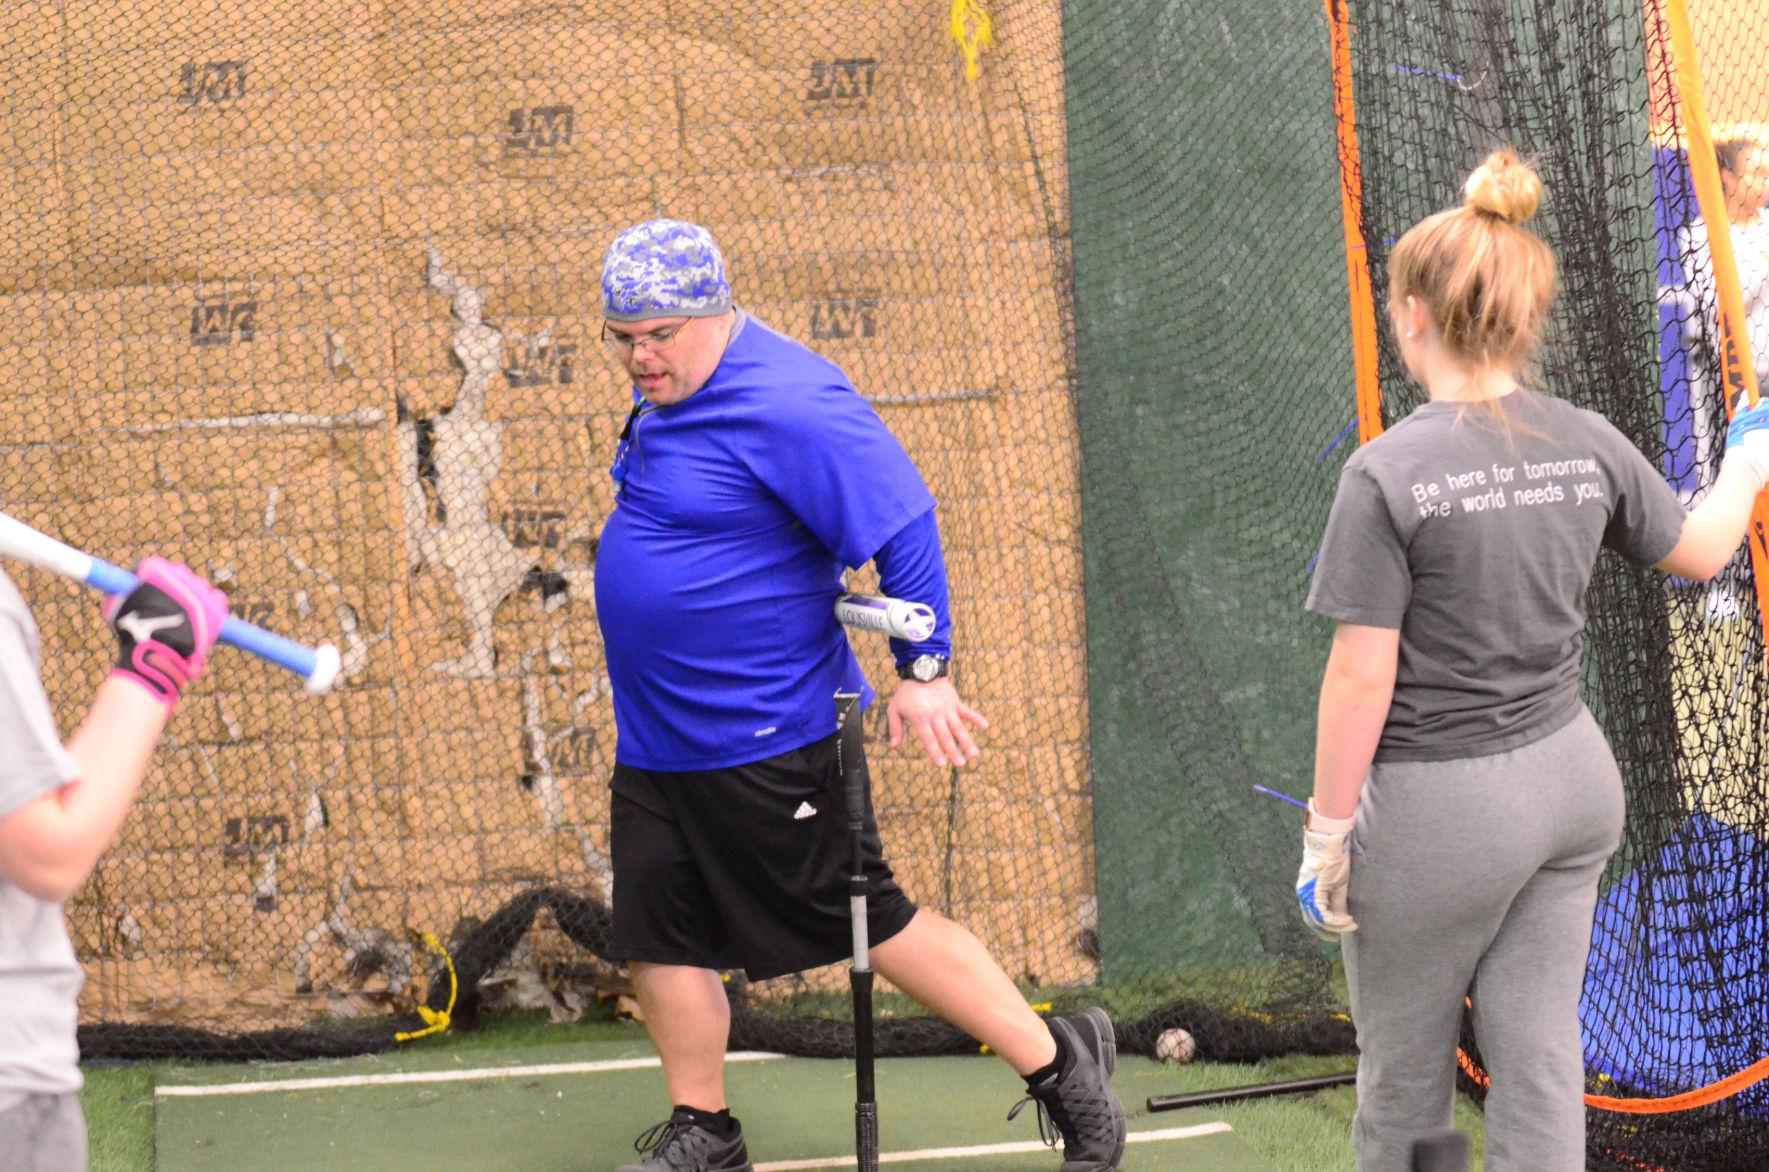 Craig optimistic about Lady Jays heading into softball season